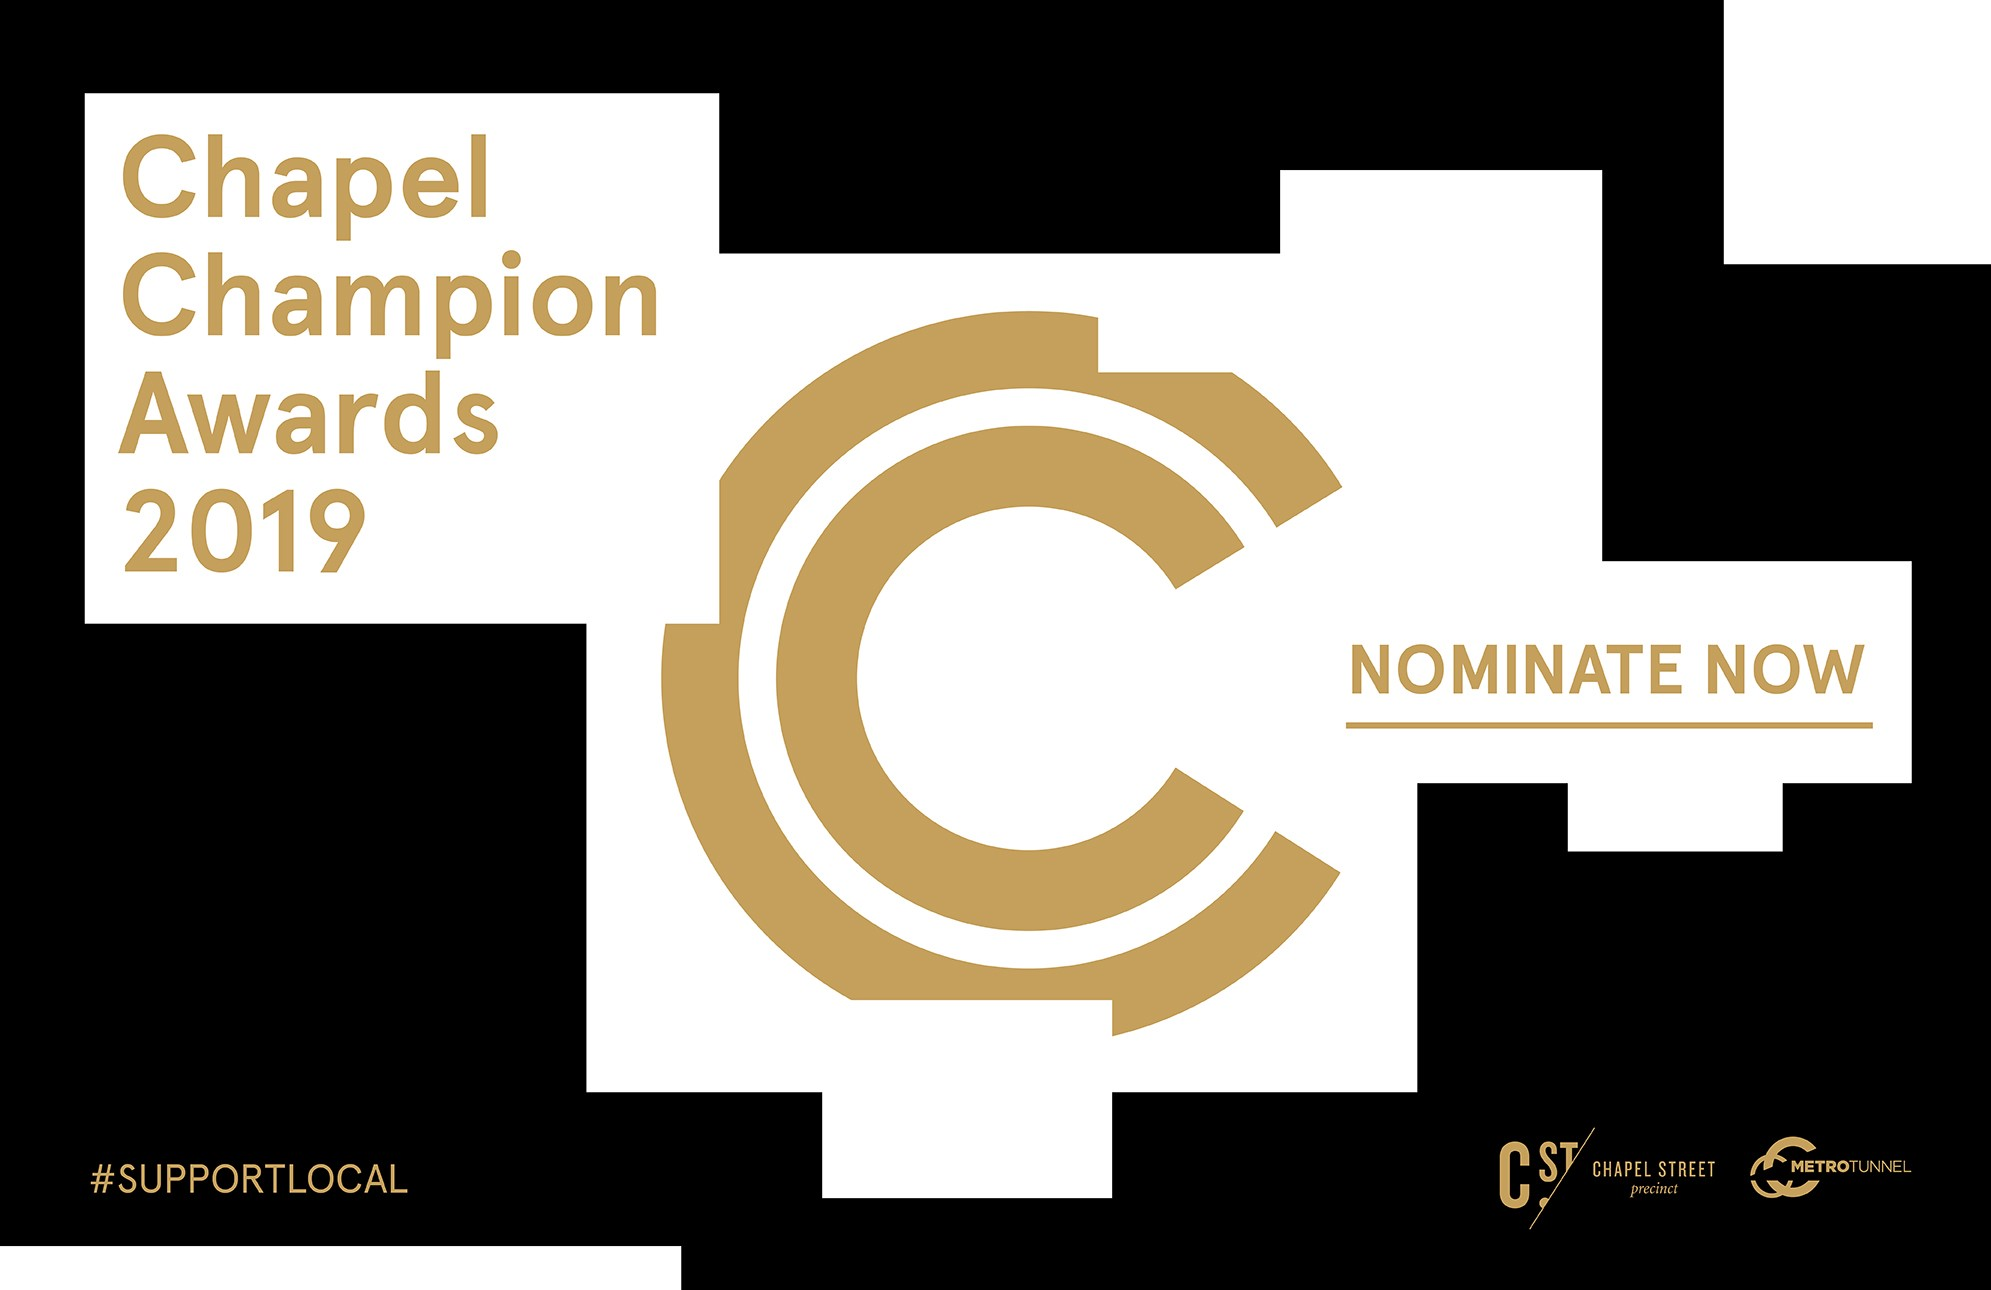 Chapel Champion Awards 2019